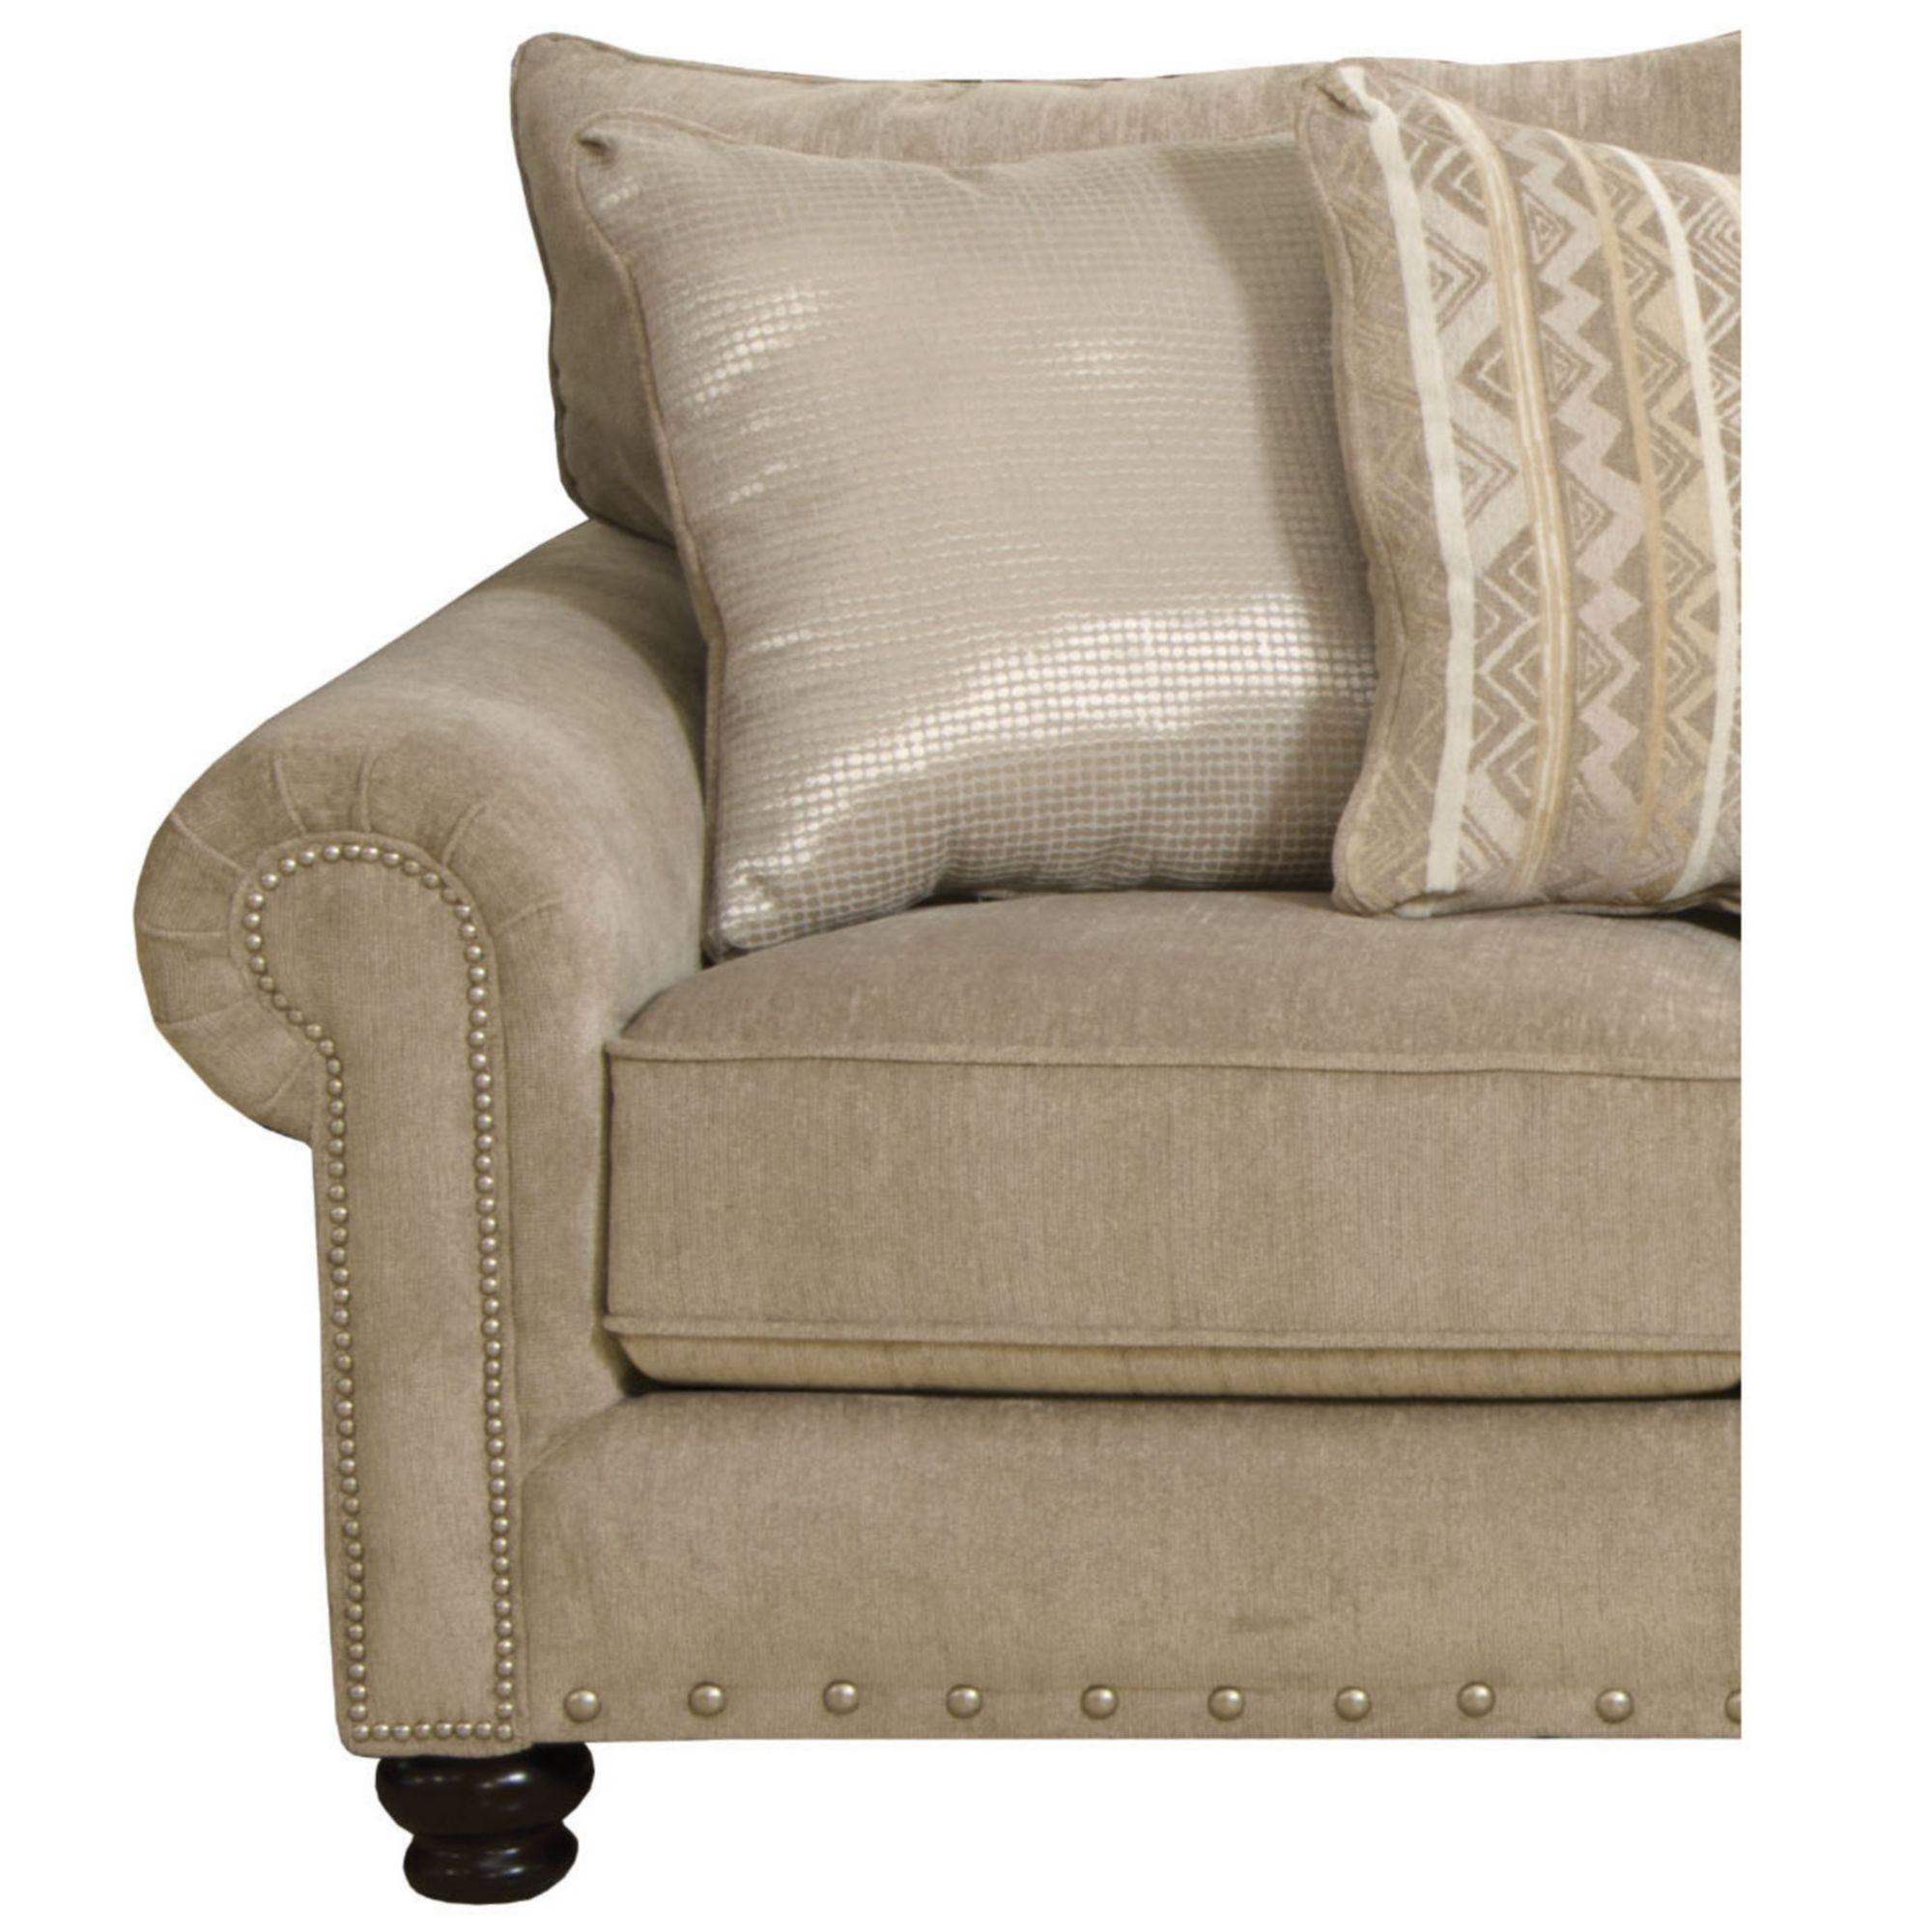 Chair And A Half US Mattress